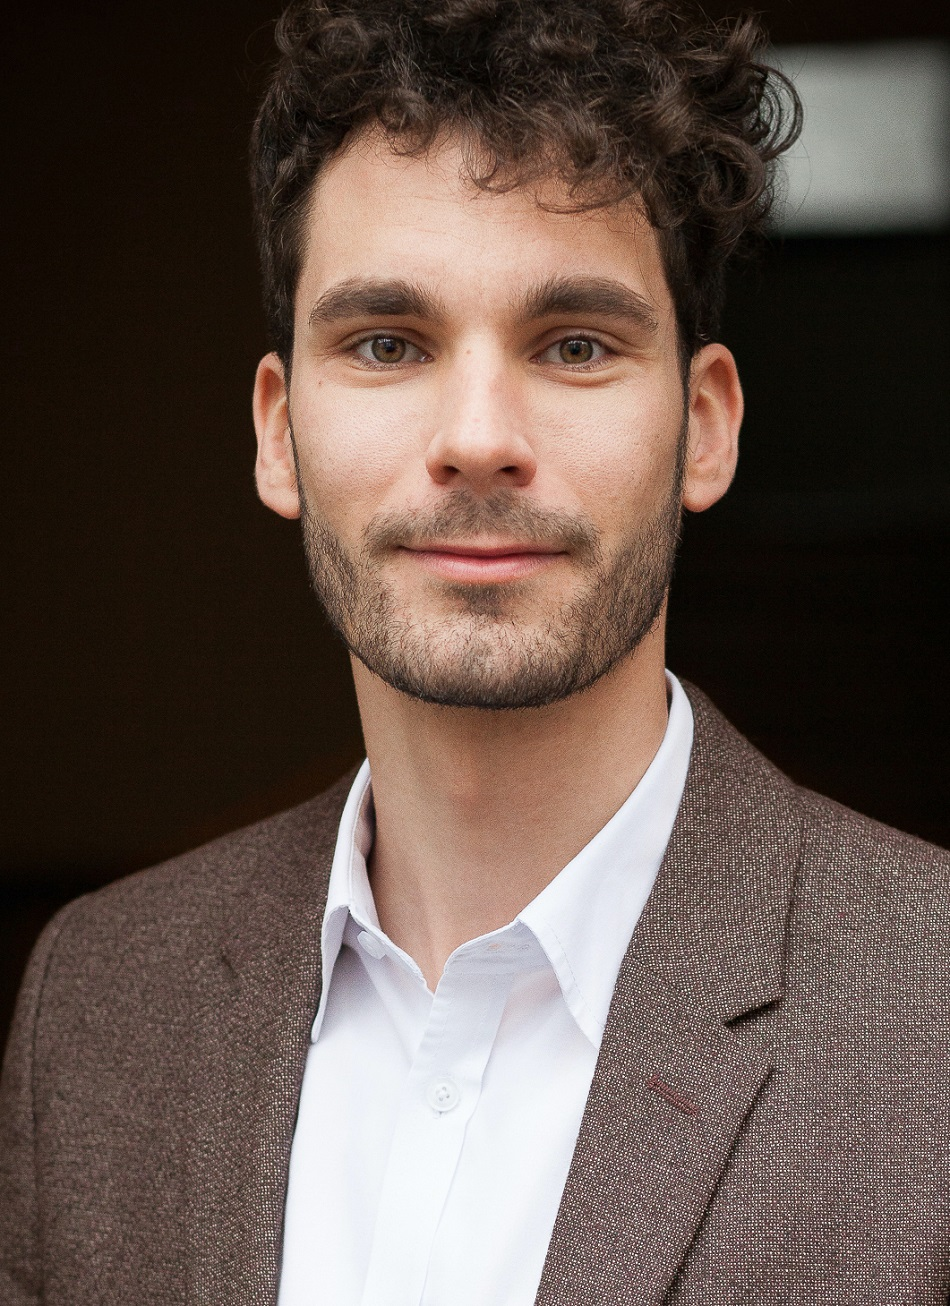 Christoph Klanten (Bild: privat)